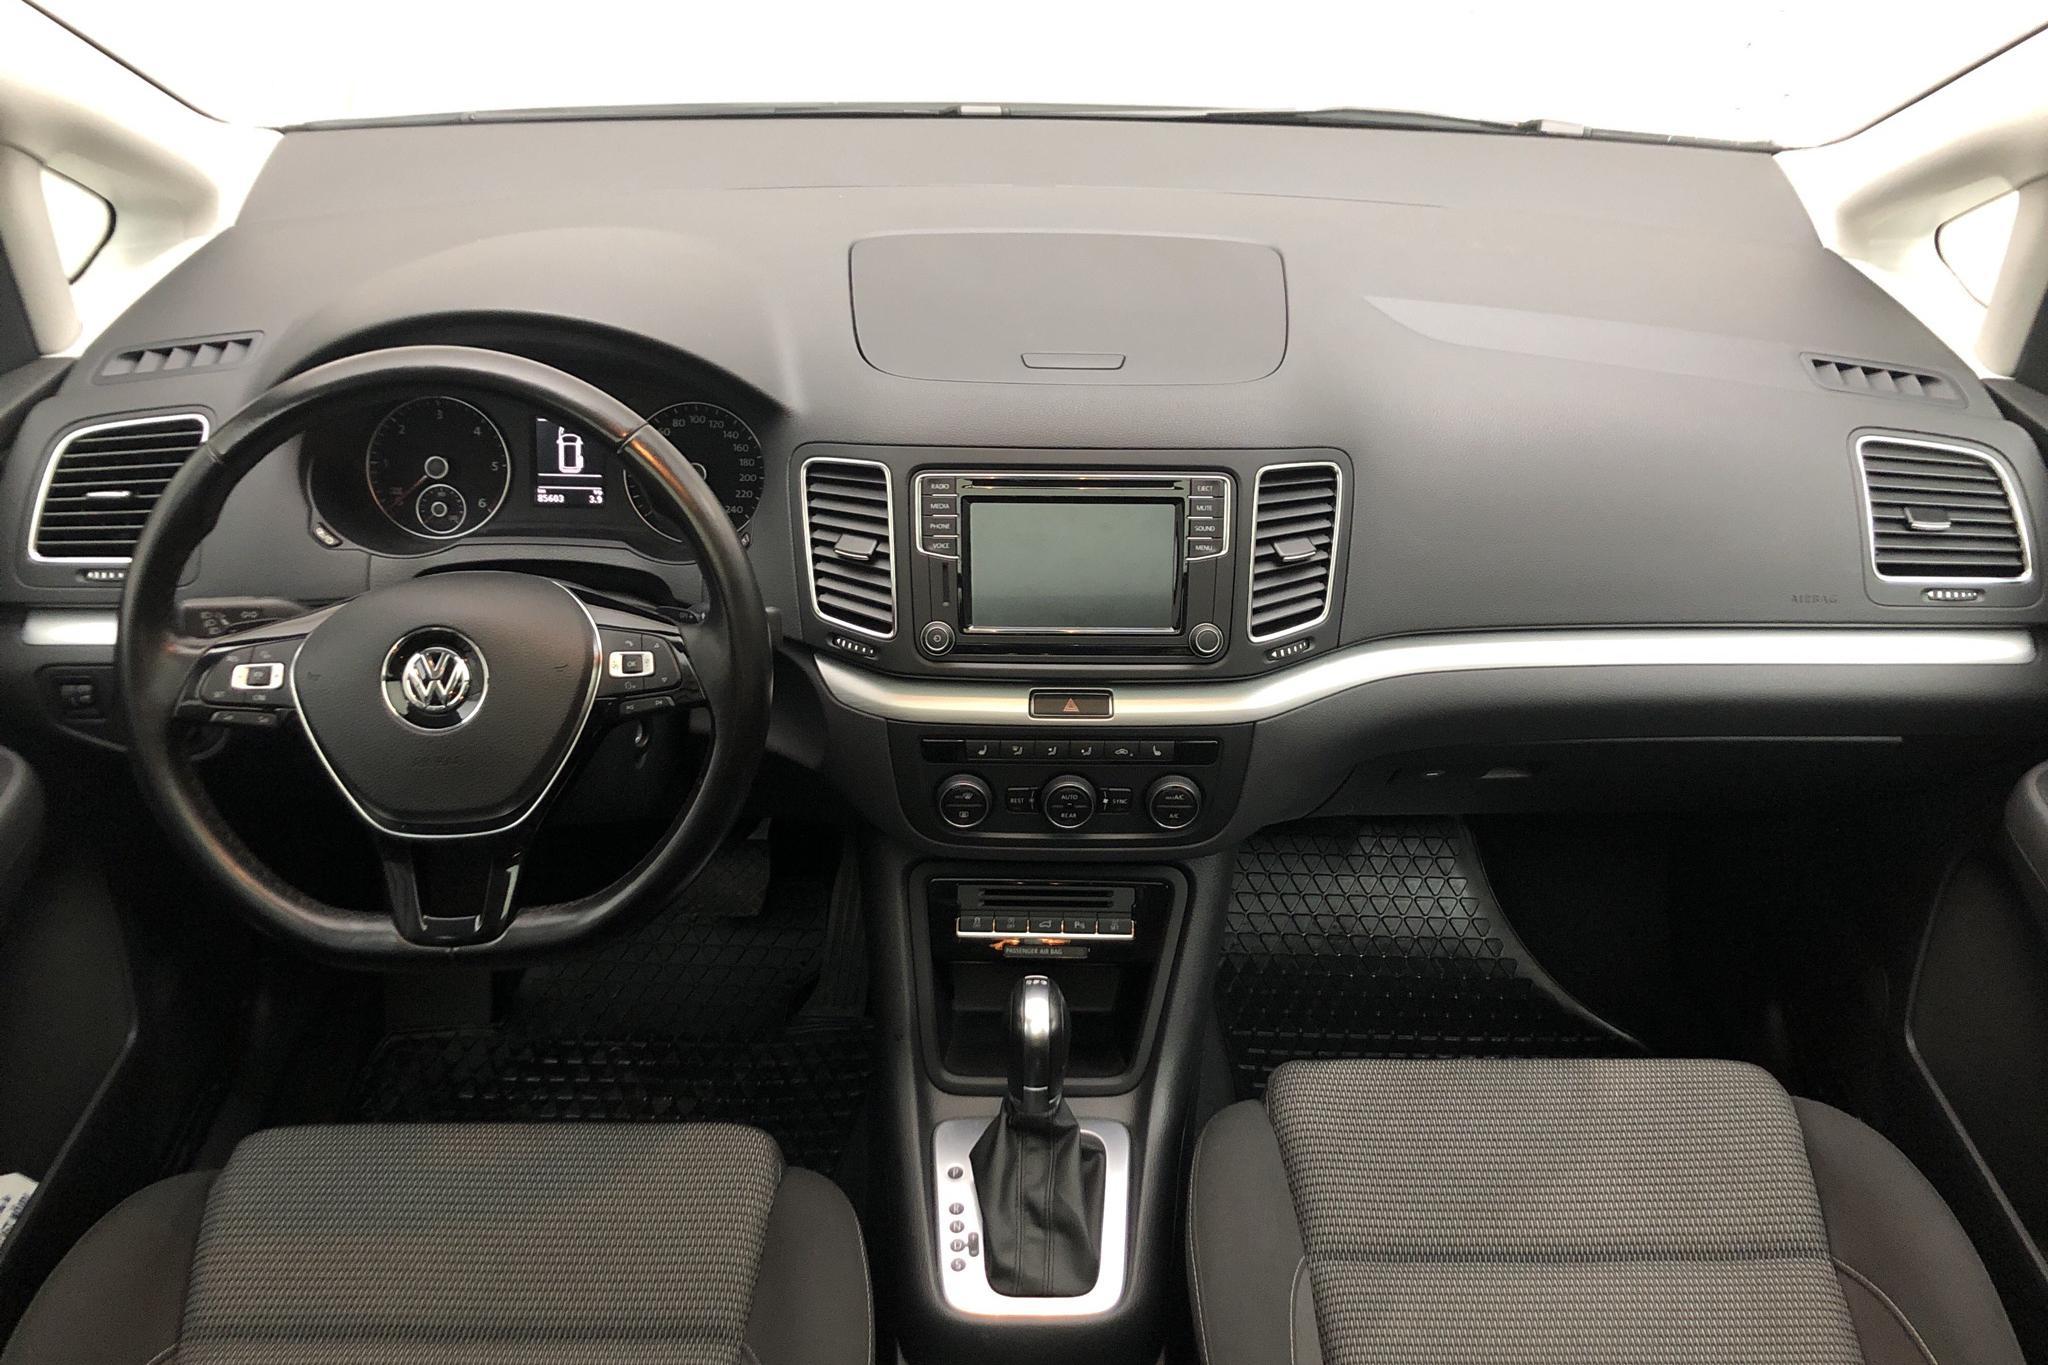 VW Sharan 2.0 TDI (150hk) - 85 590 km - Automatic - white - 2017